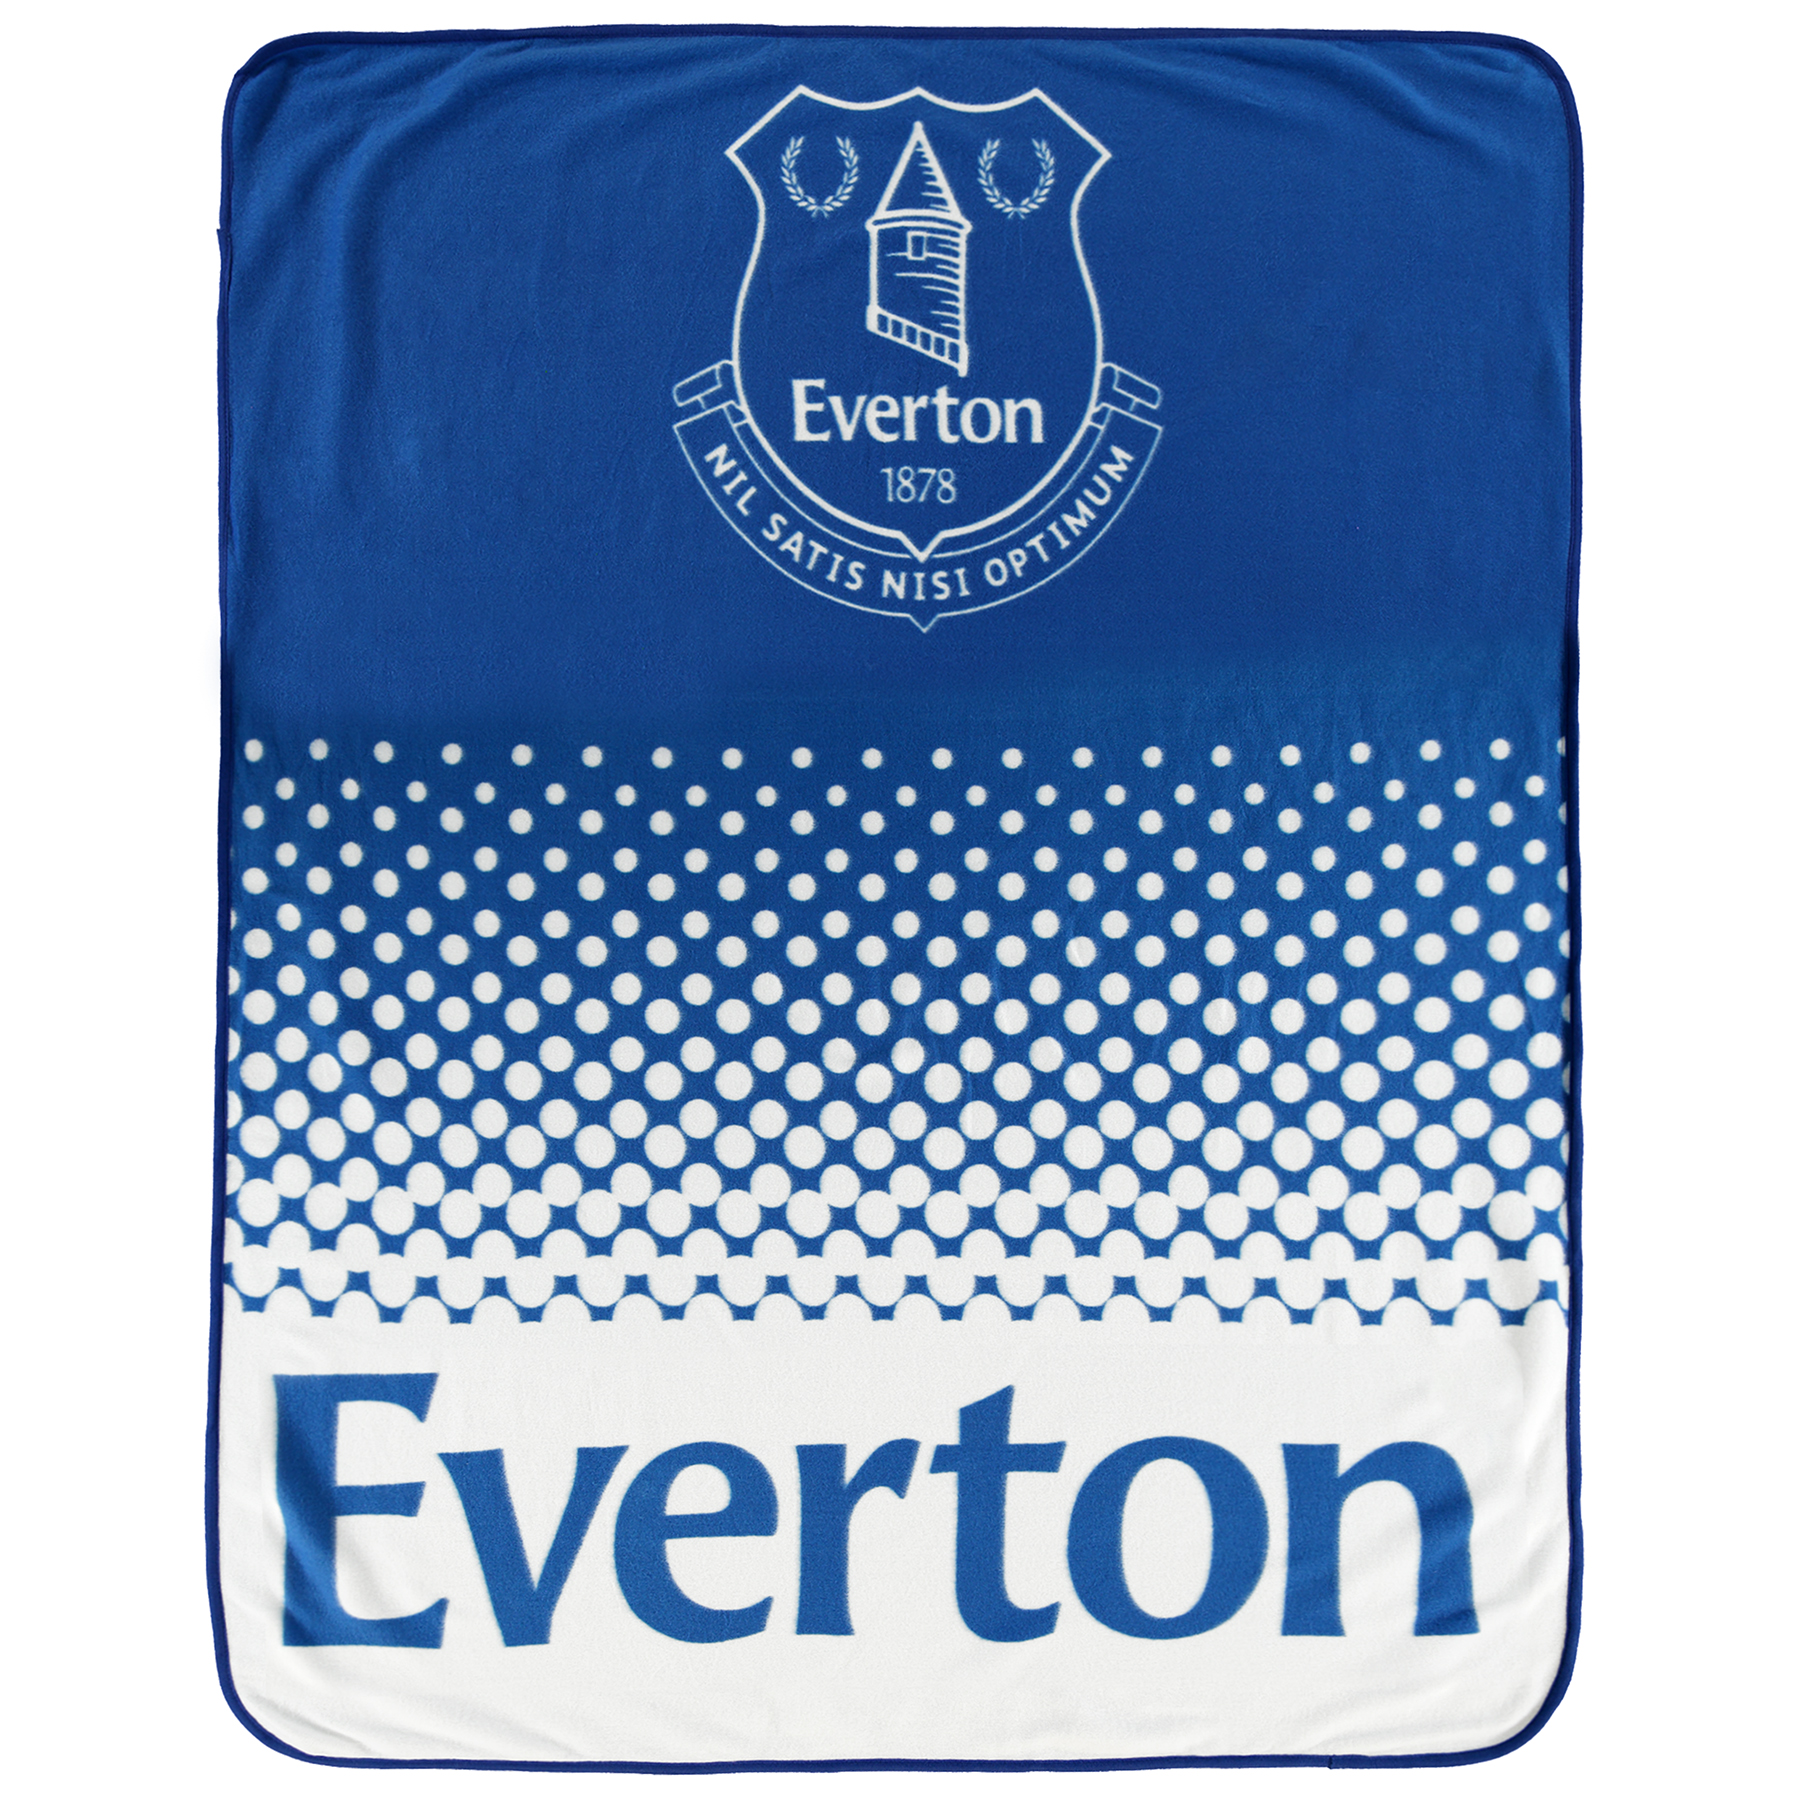 Everton Fade Fleece Blanket